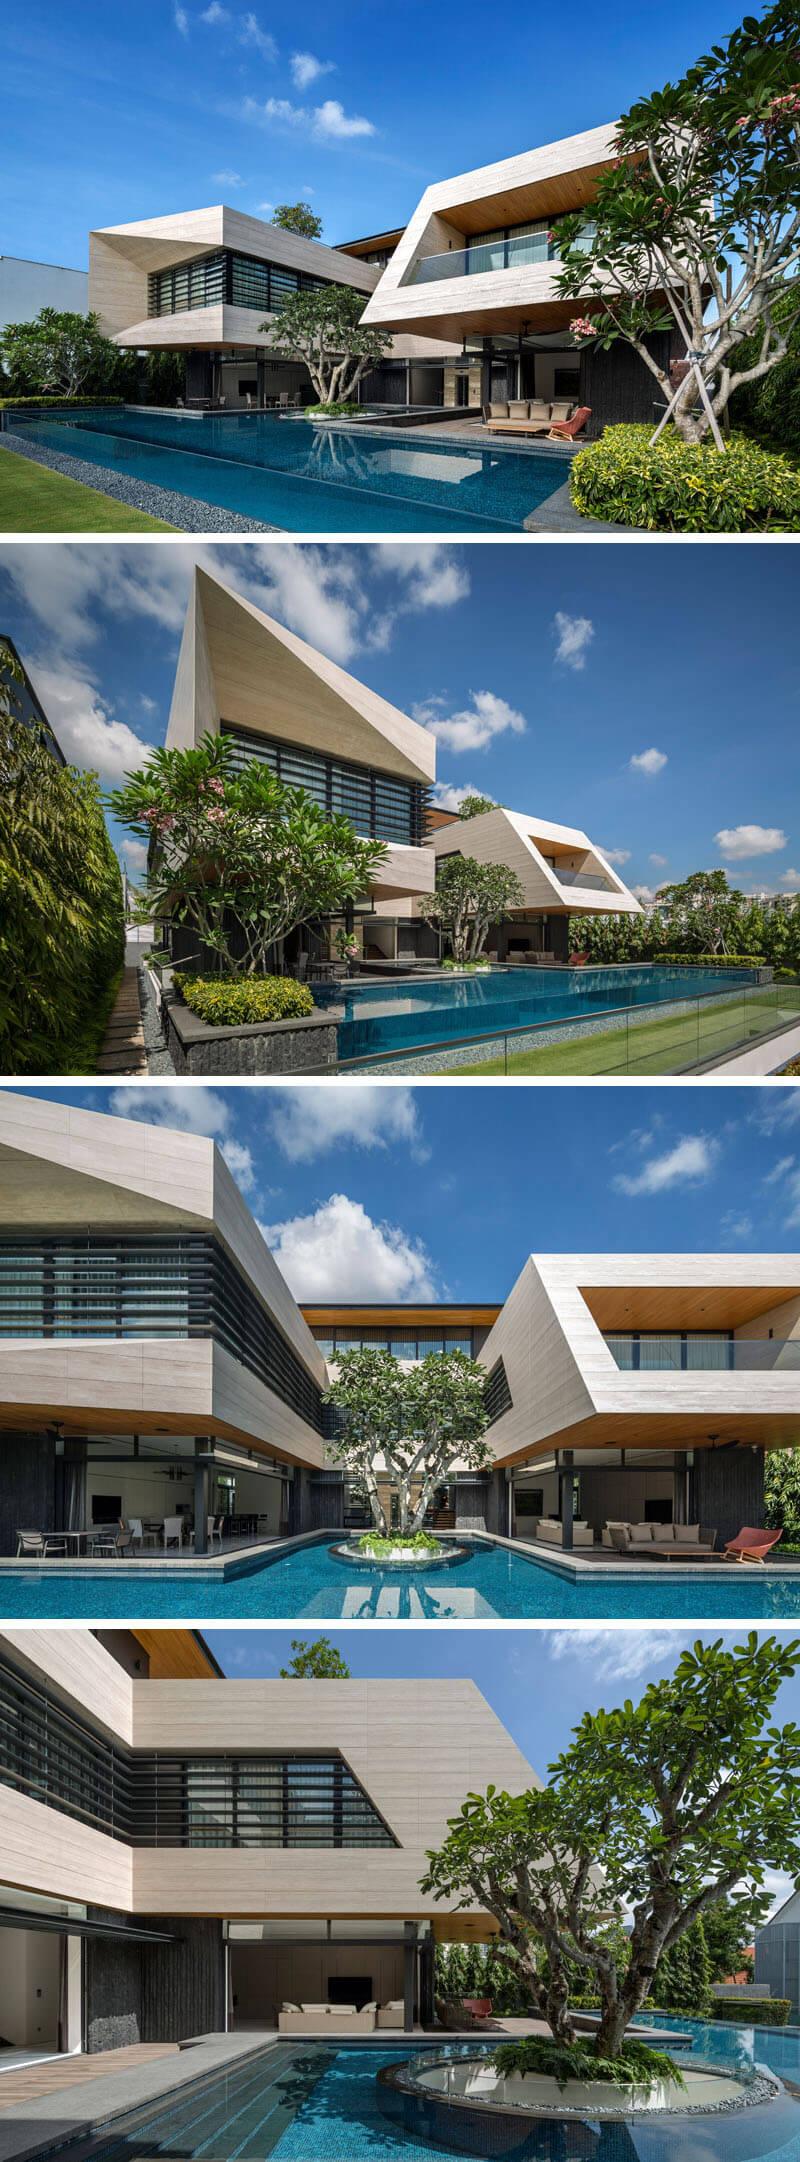 forever house wallflower architecture 10 (1)